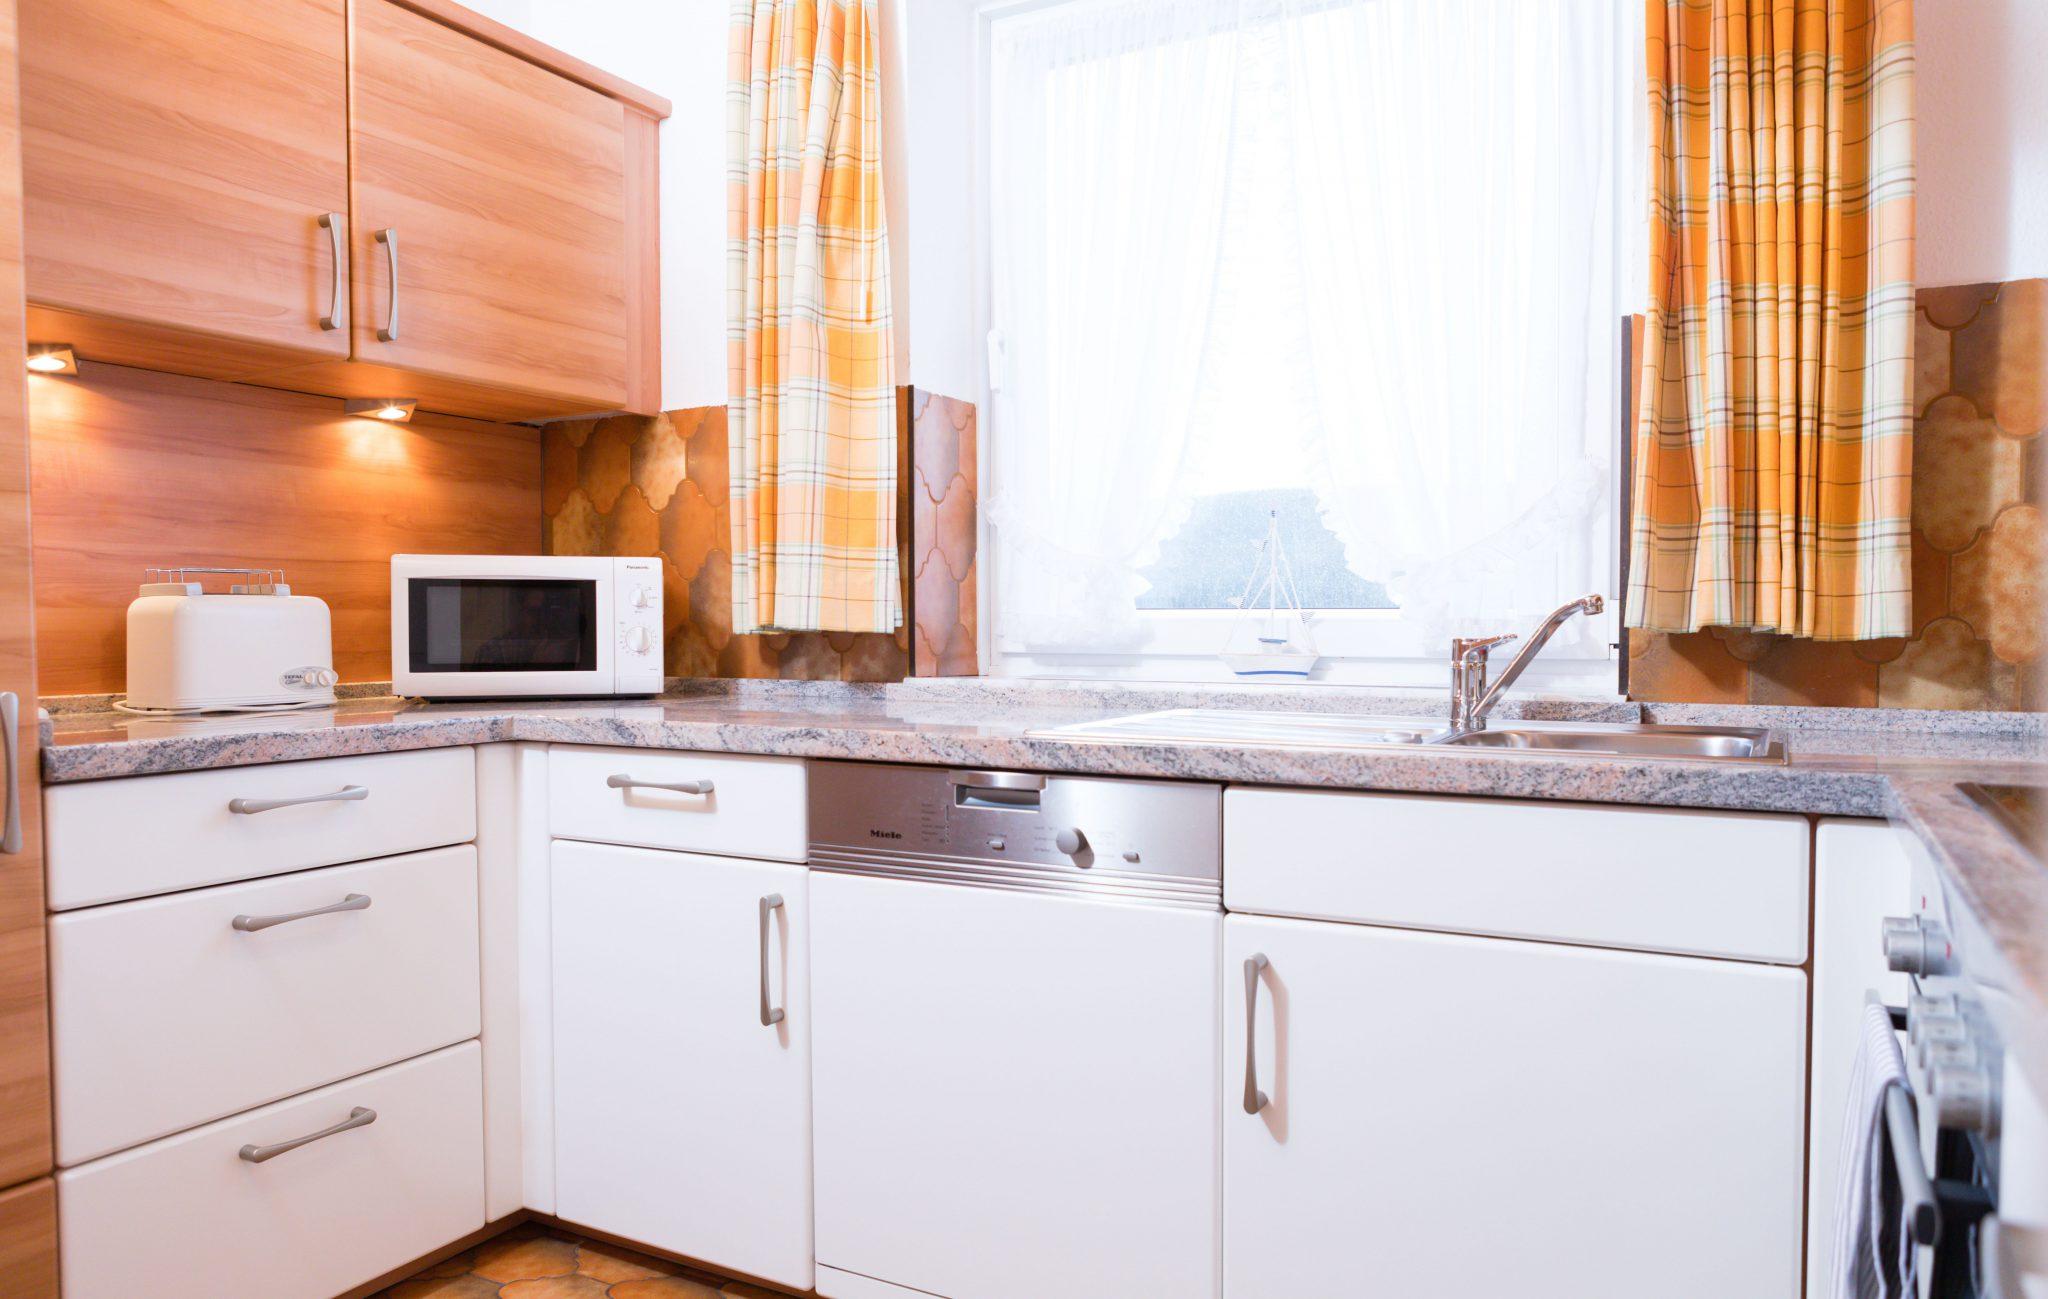 wohnung2 kueche 01 haus tom kyle. Black Bedroom Furniture Sets. Home Design Ideas